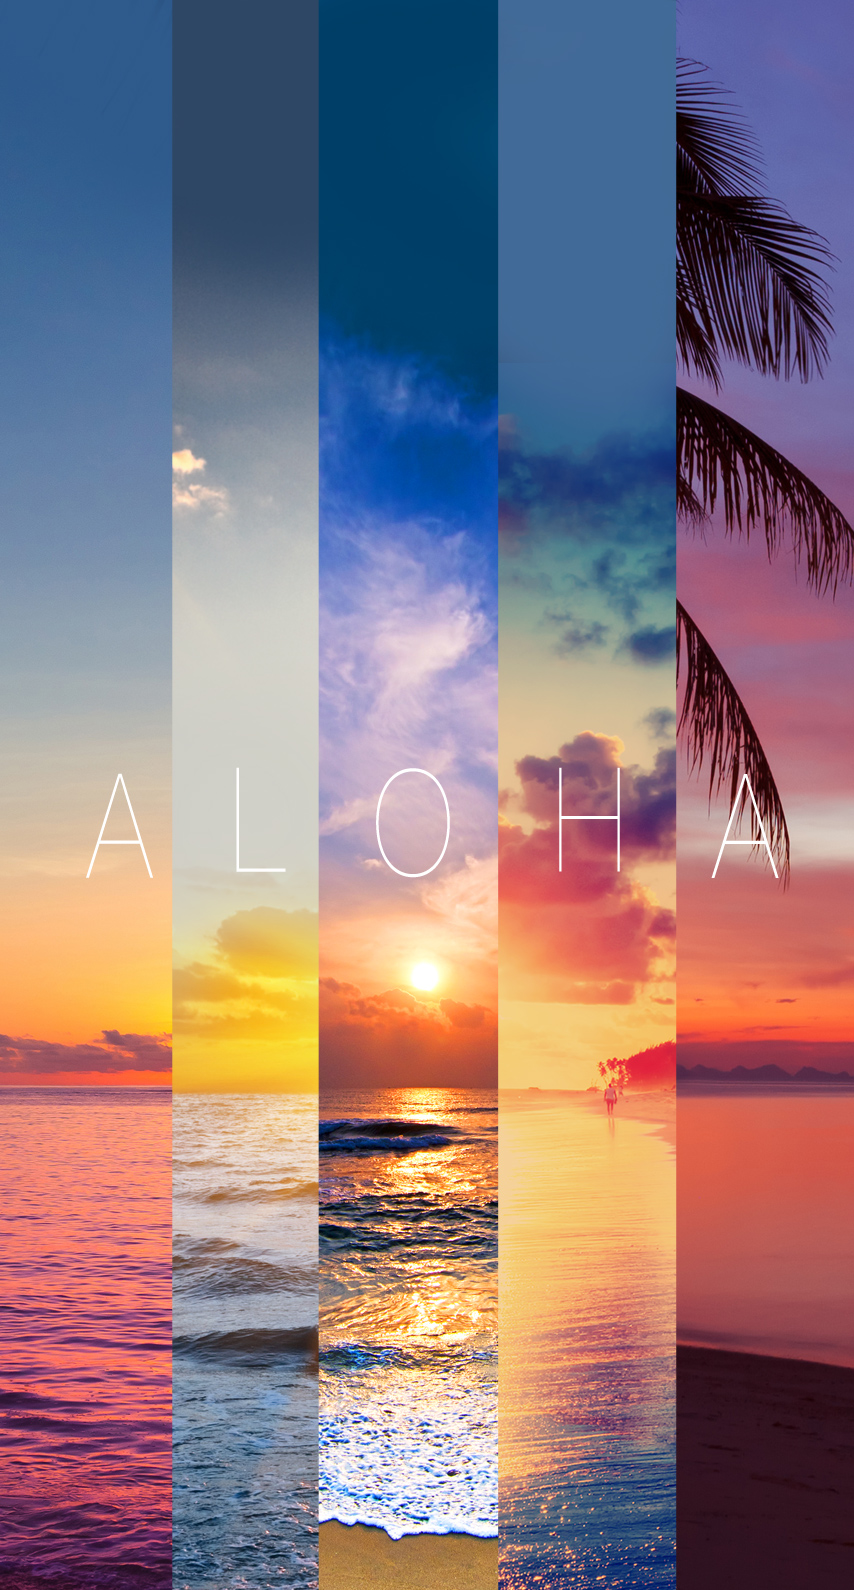 bright, summer, evening, sun, no person, dawn, fair weather, dusk, reflection, seascape, composure